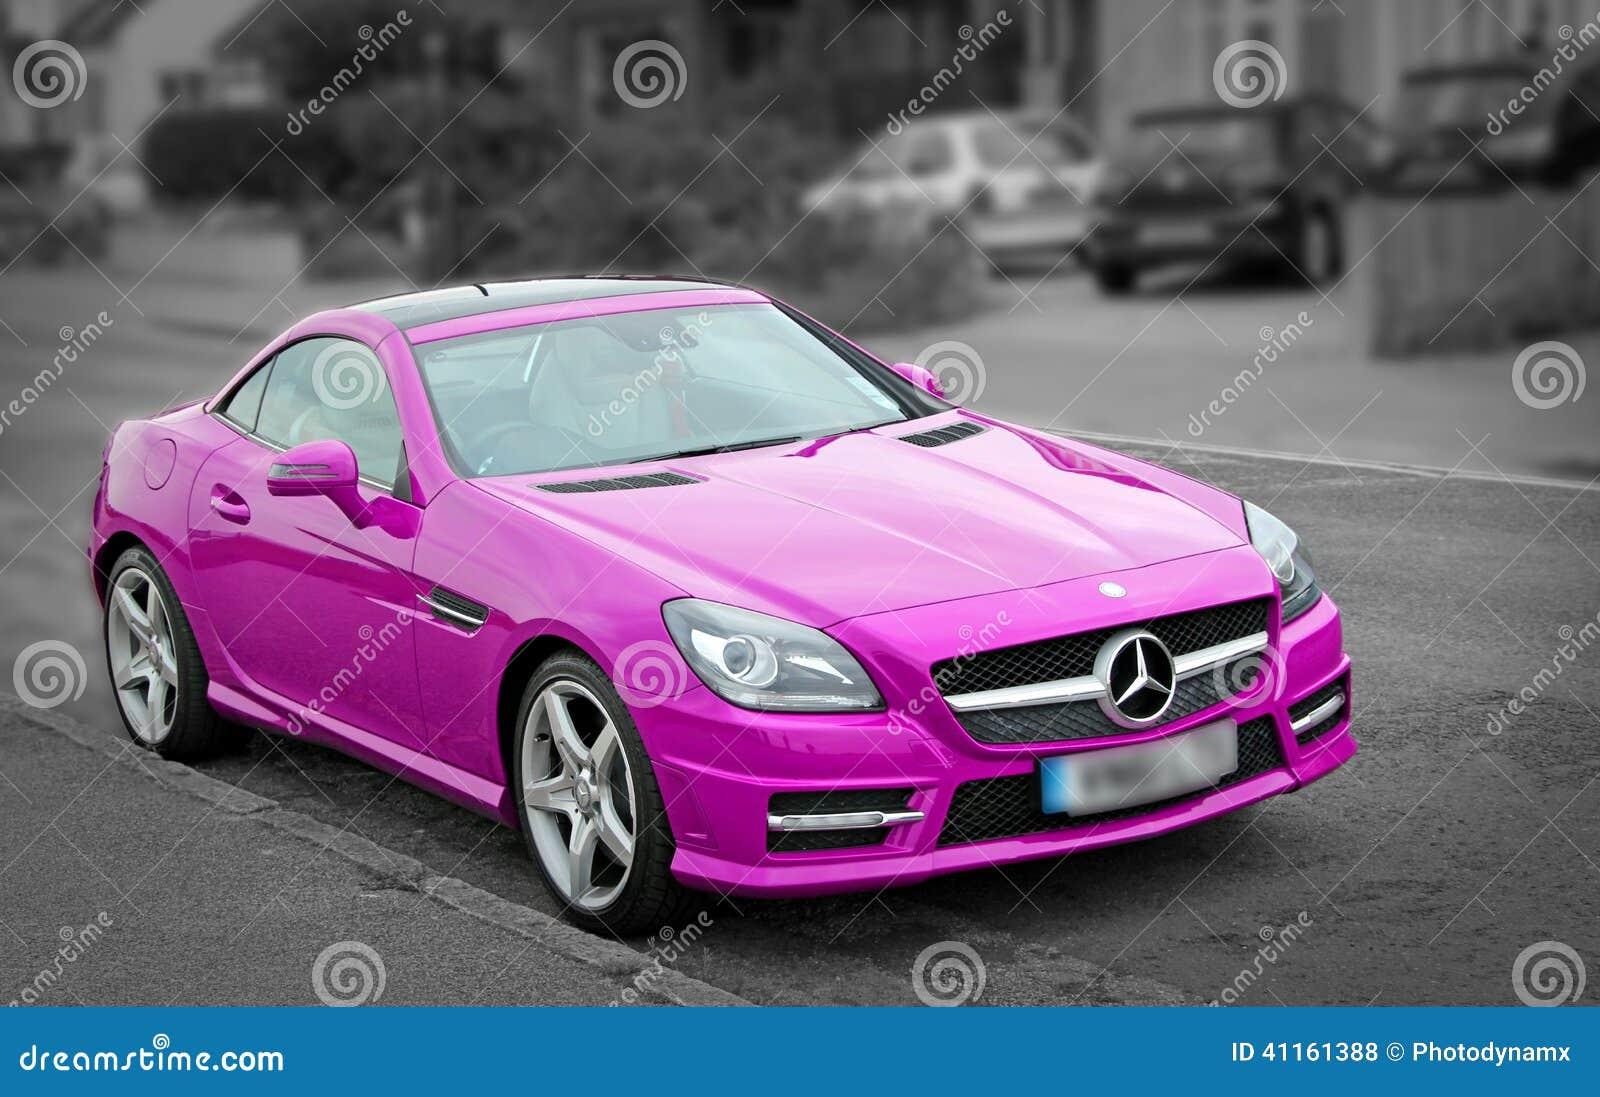 Lipstick Pink Car Paint